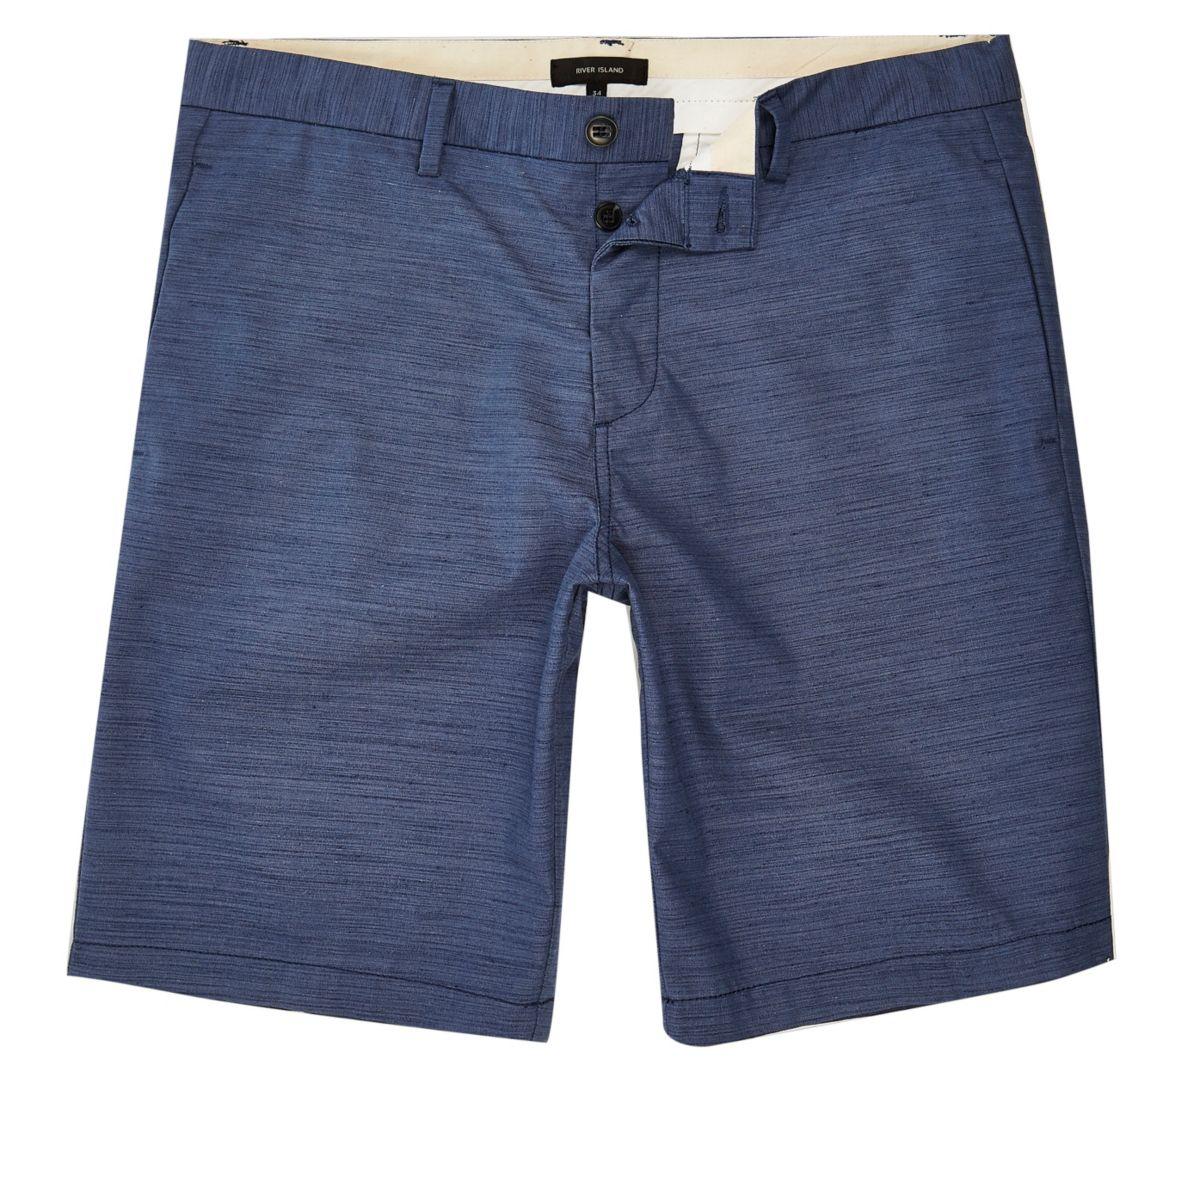 Blaue, strukturierte Chino-Shorts